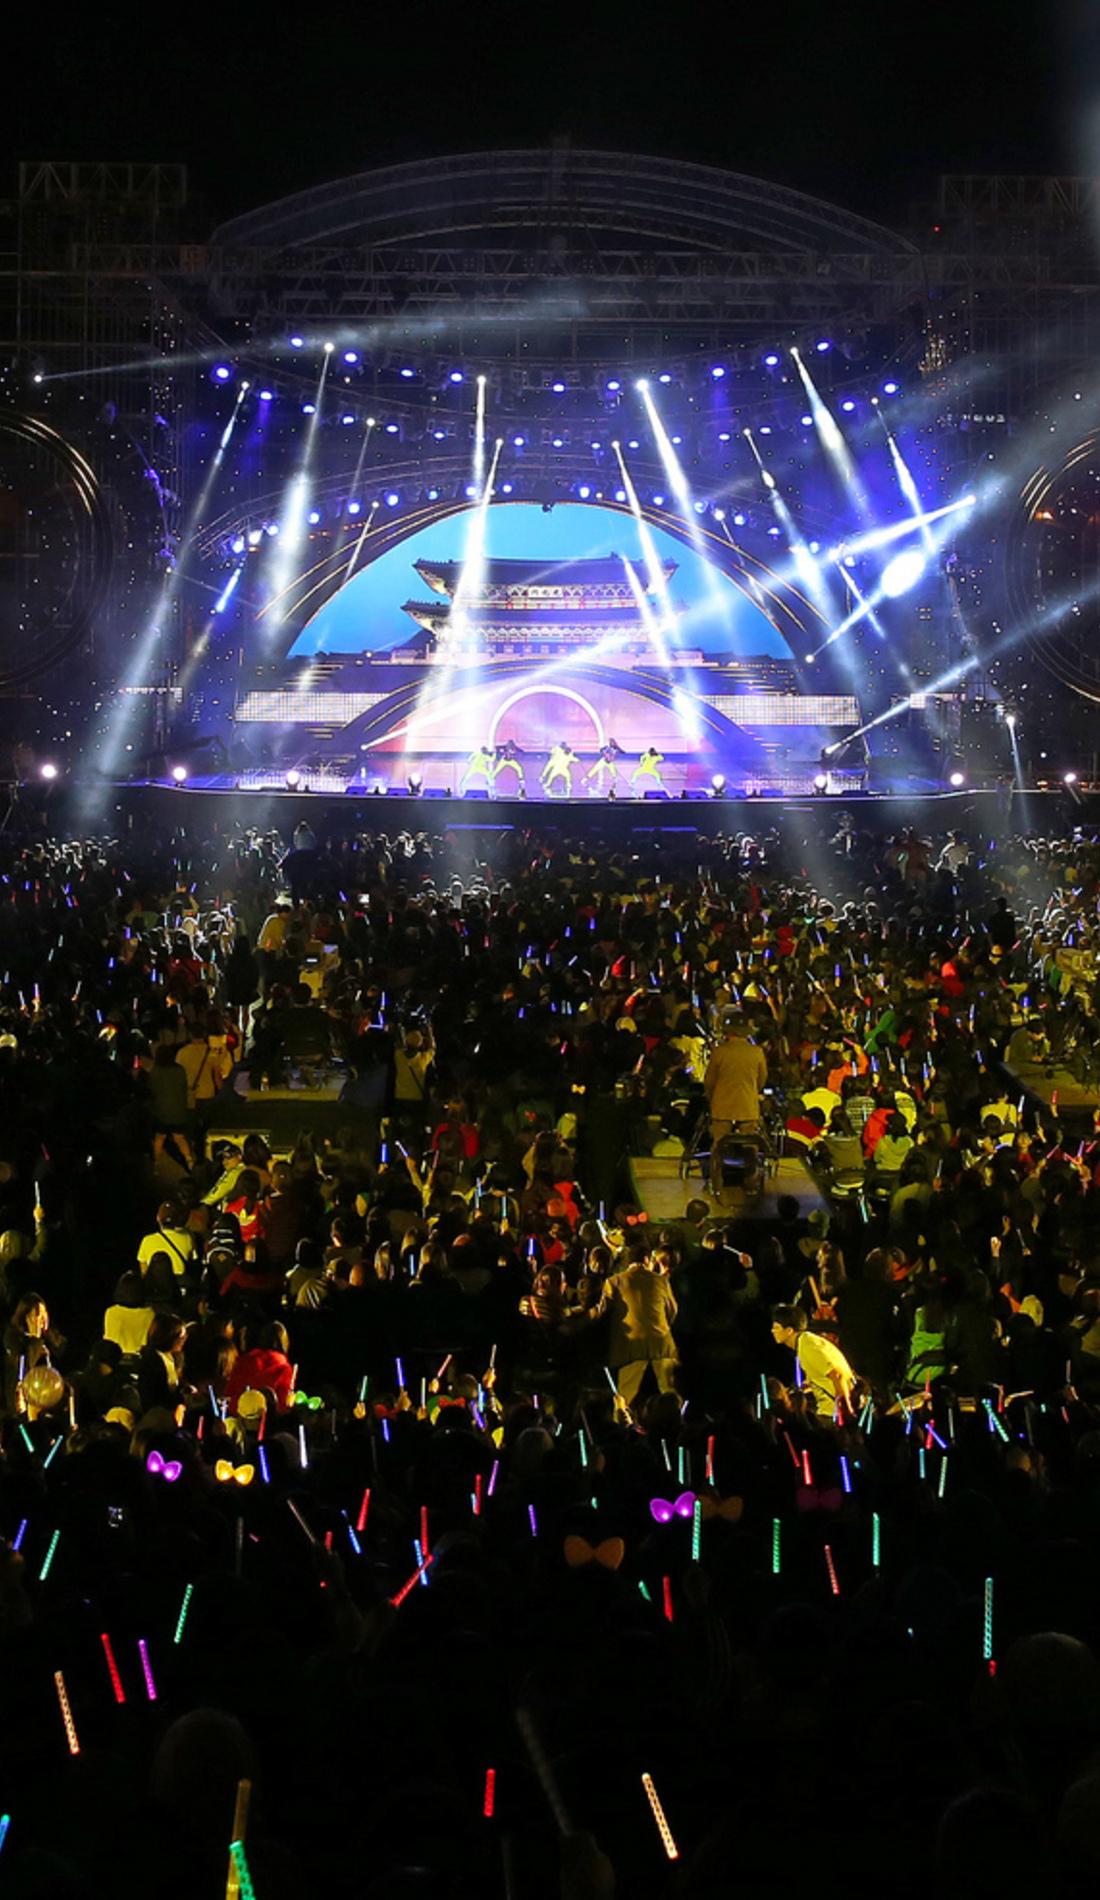 A Patriotic Festival live event